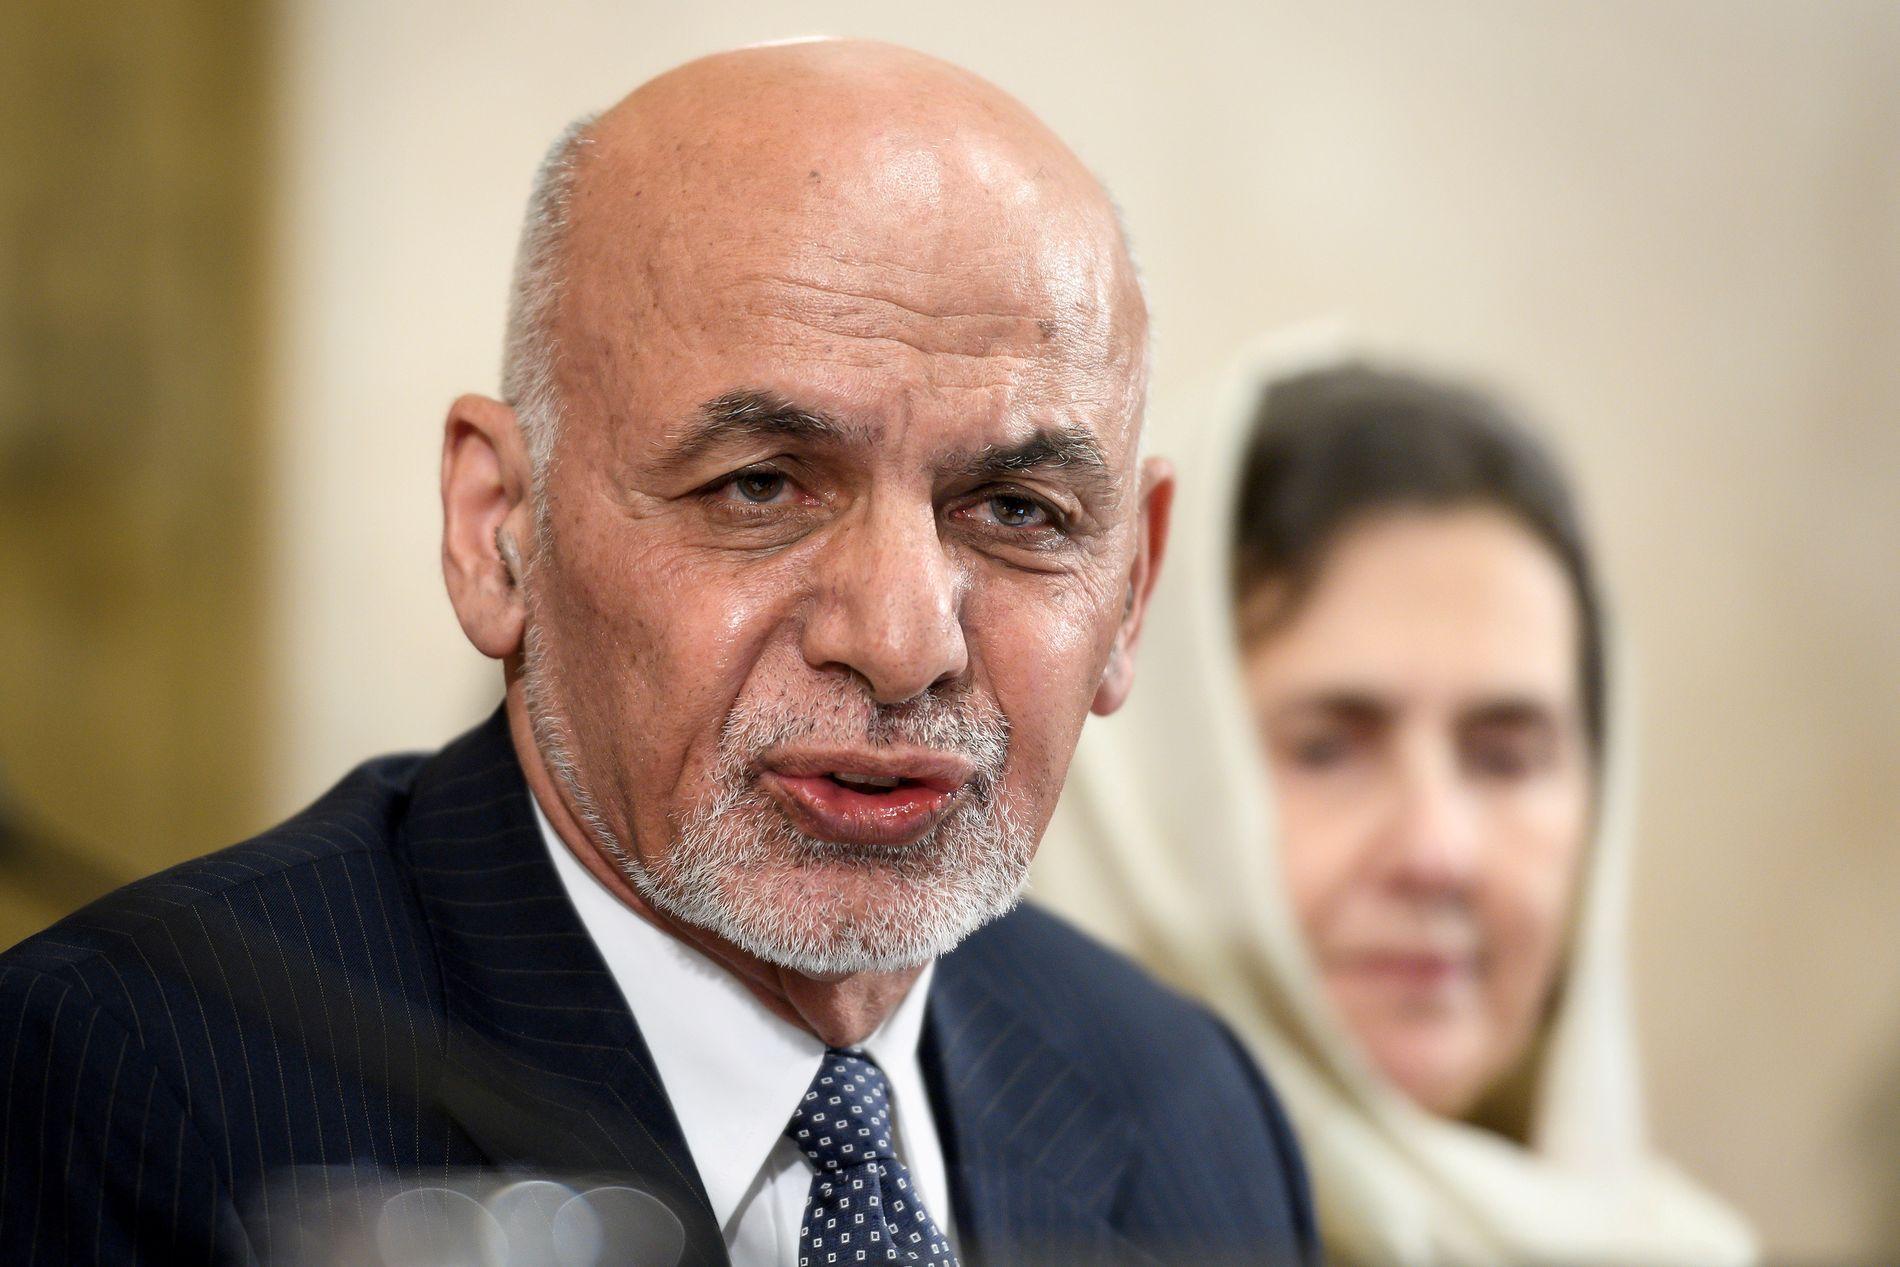 SKULLE TIL USA: Afghanistans president Ashraf Ghani.